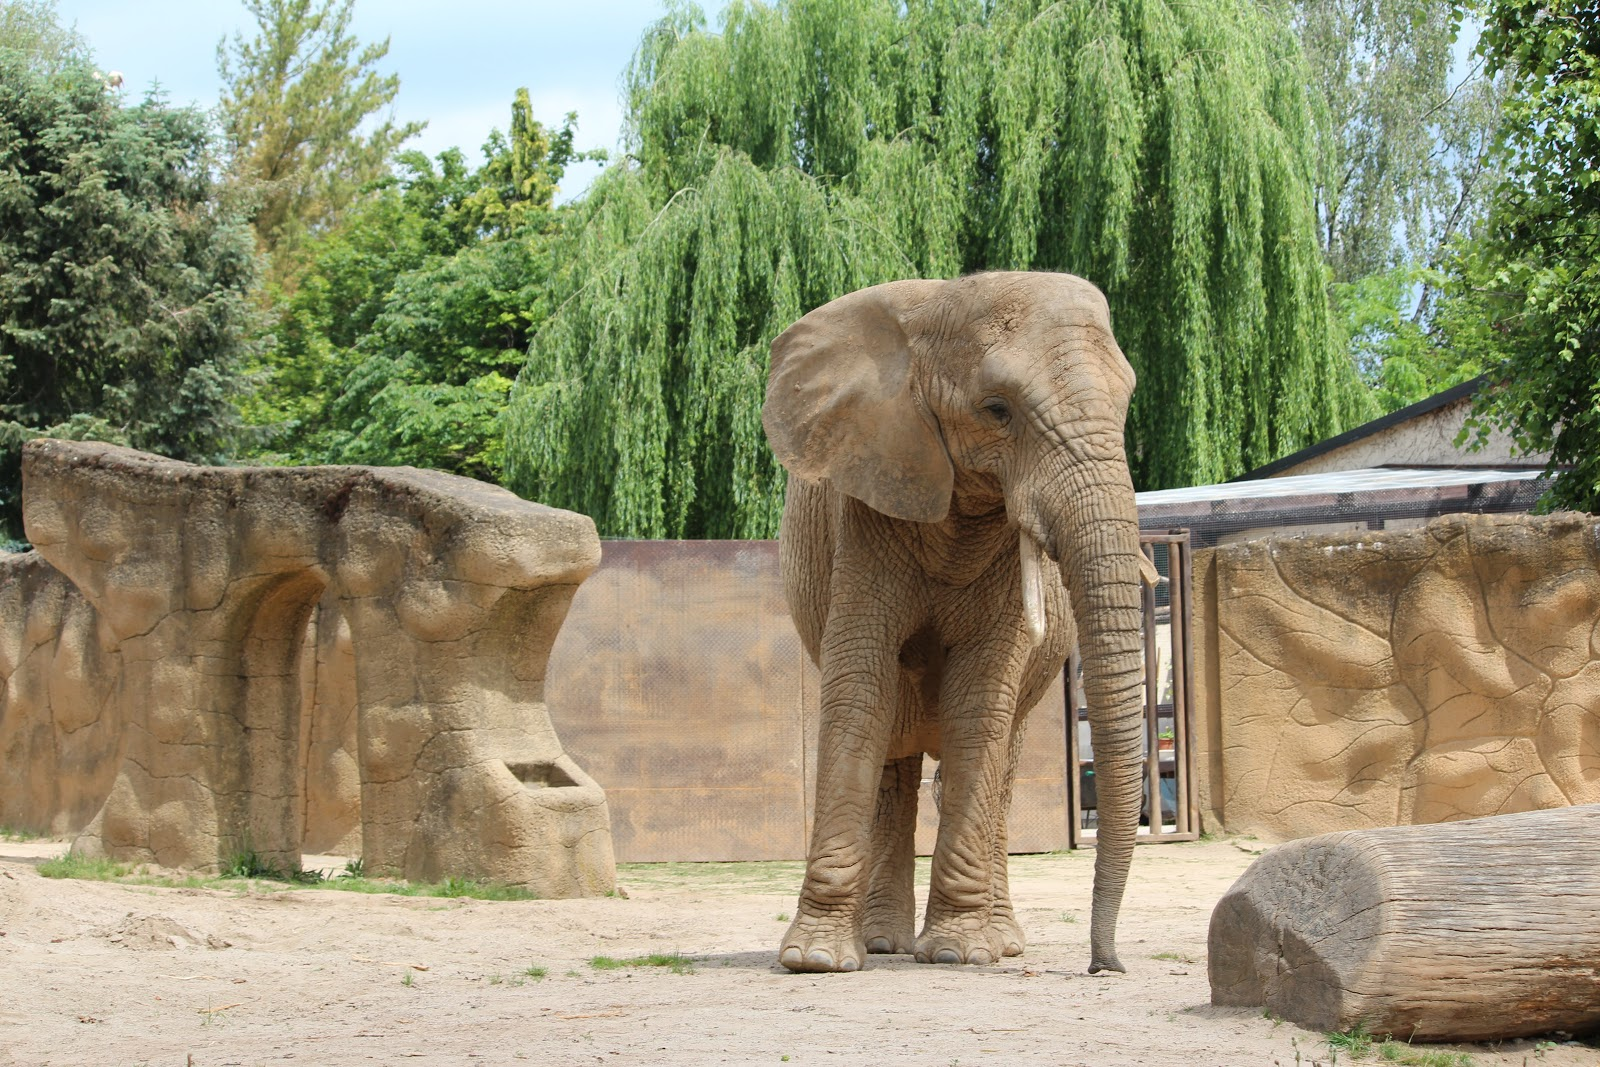 elephant at a zoo